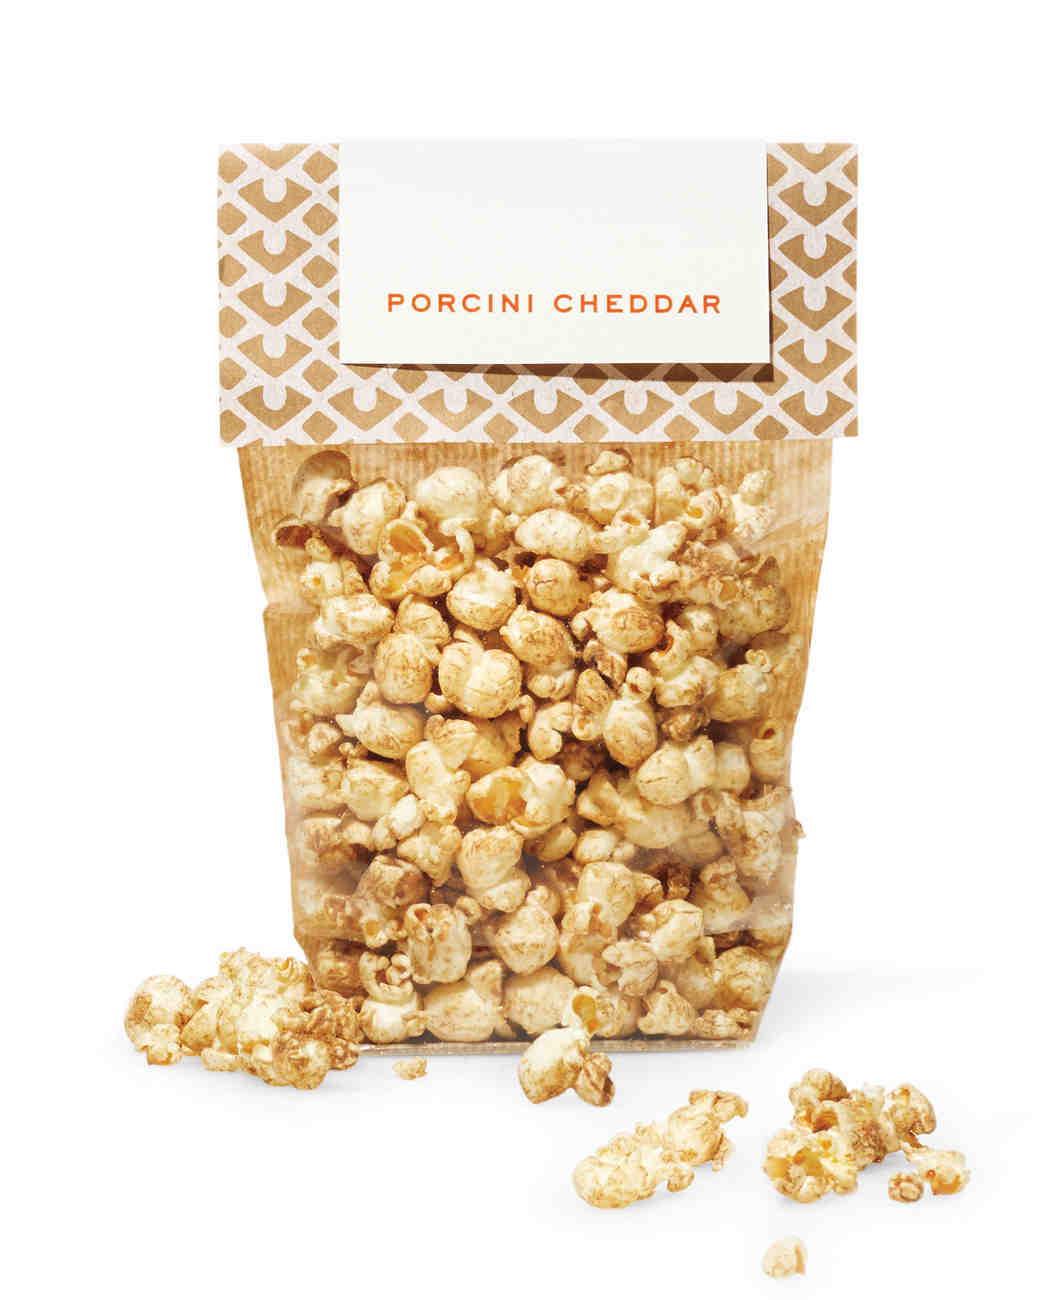 packaged-popcorn-172178-comp-mwd110687.jpg